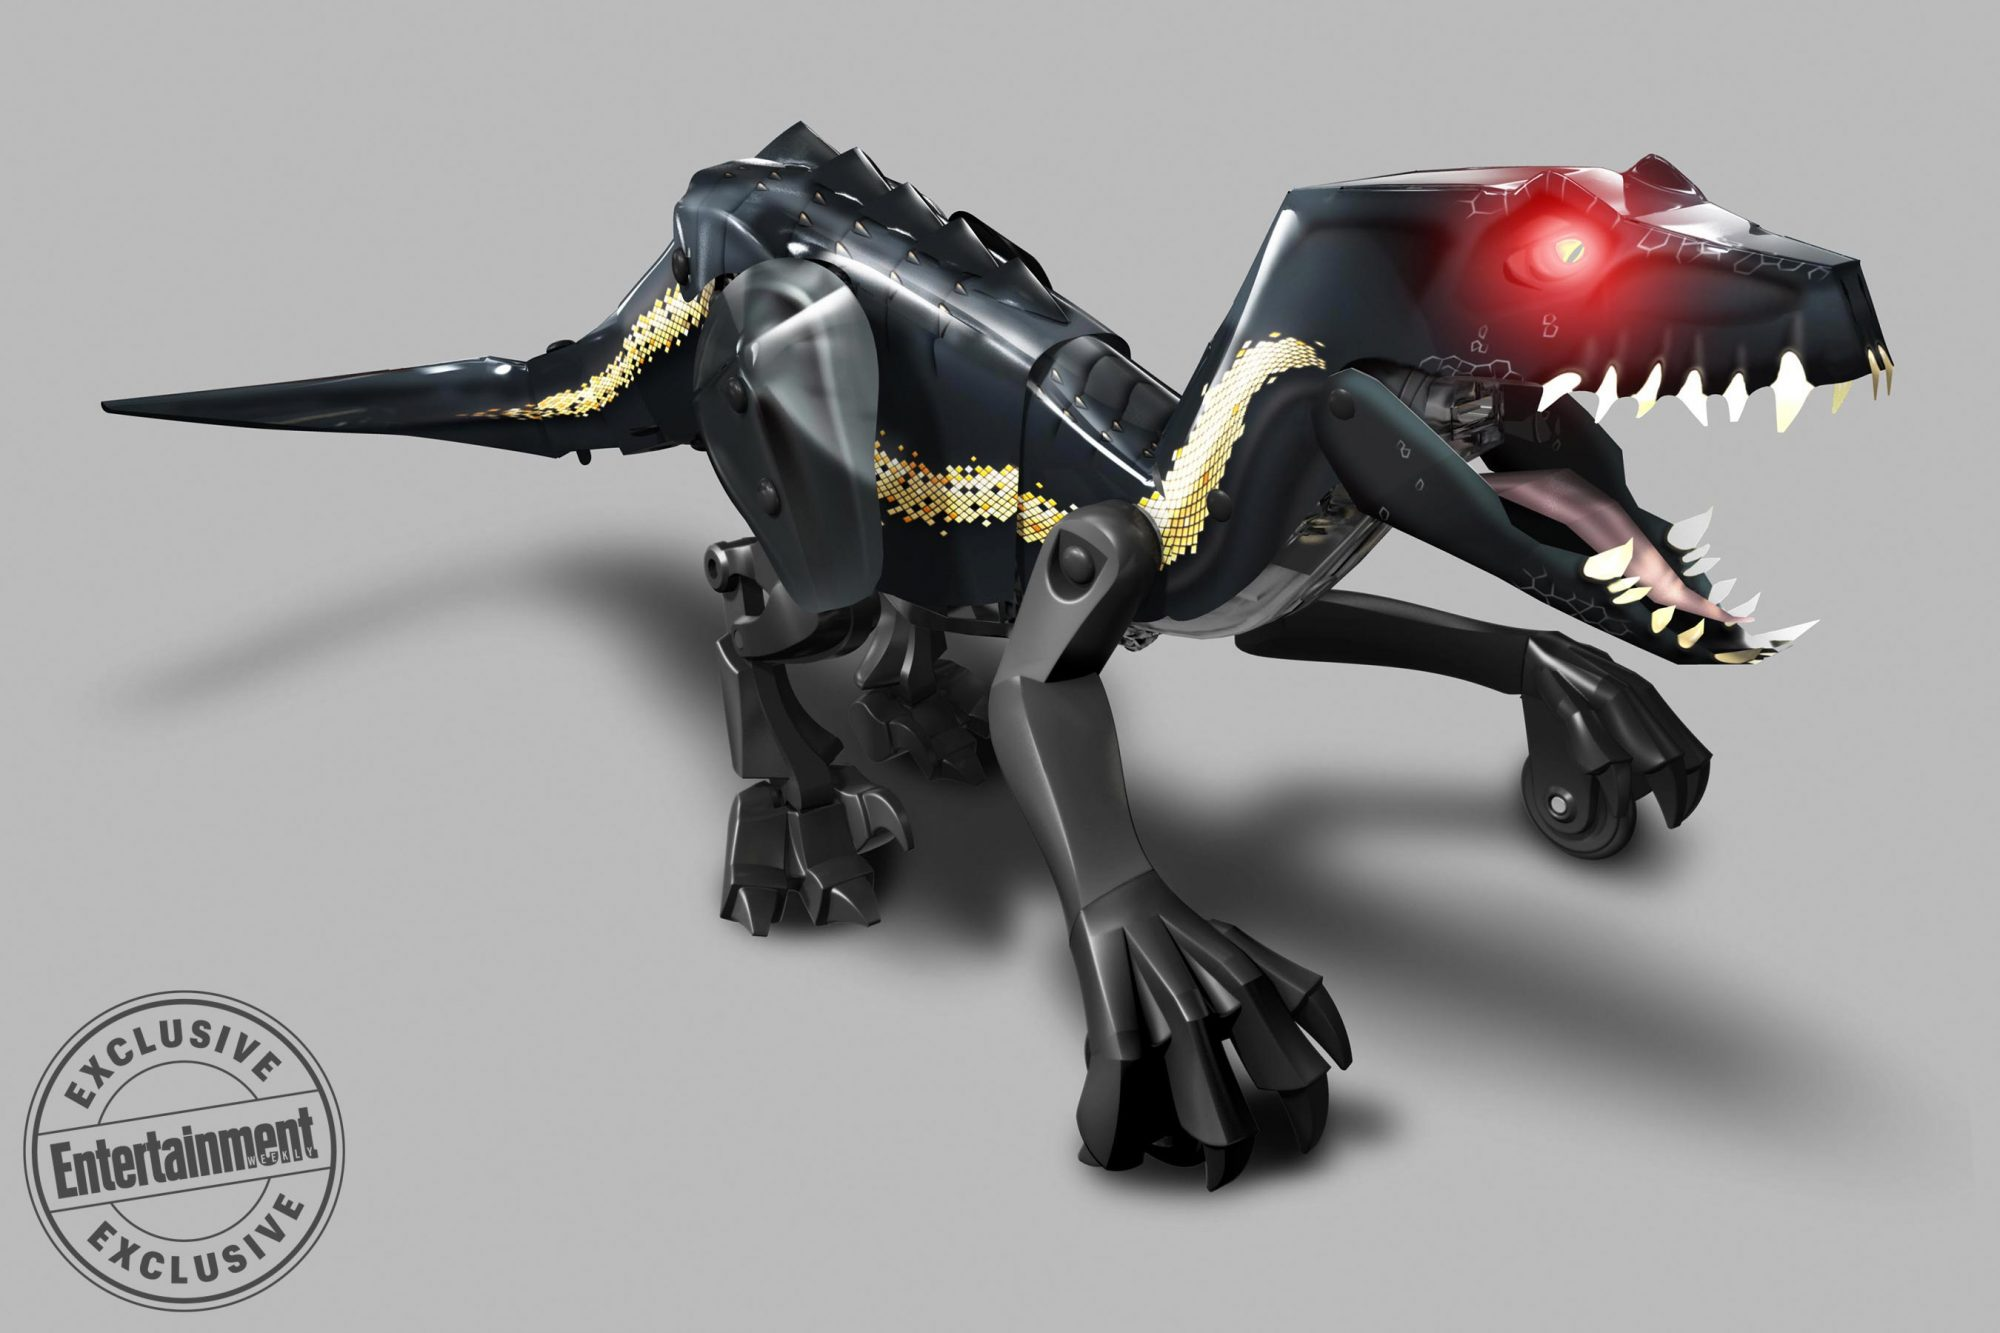 Jurassic-World-Toys-1